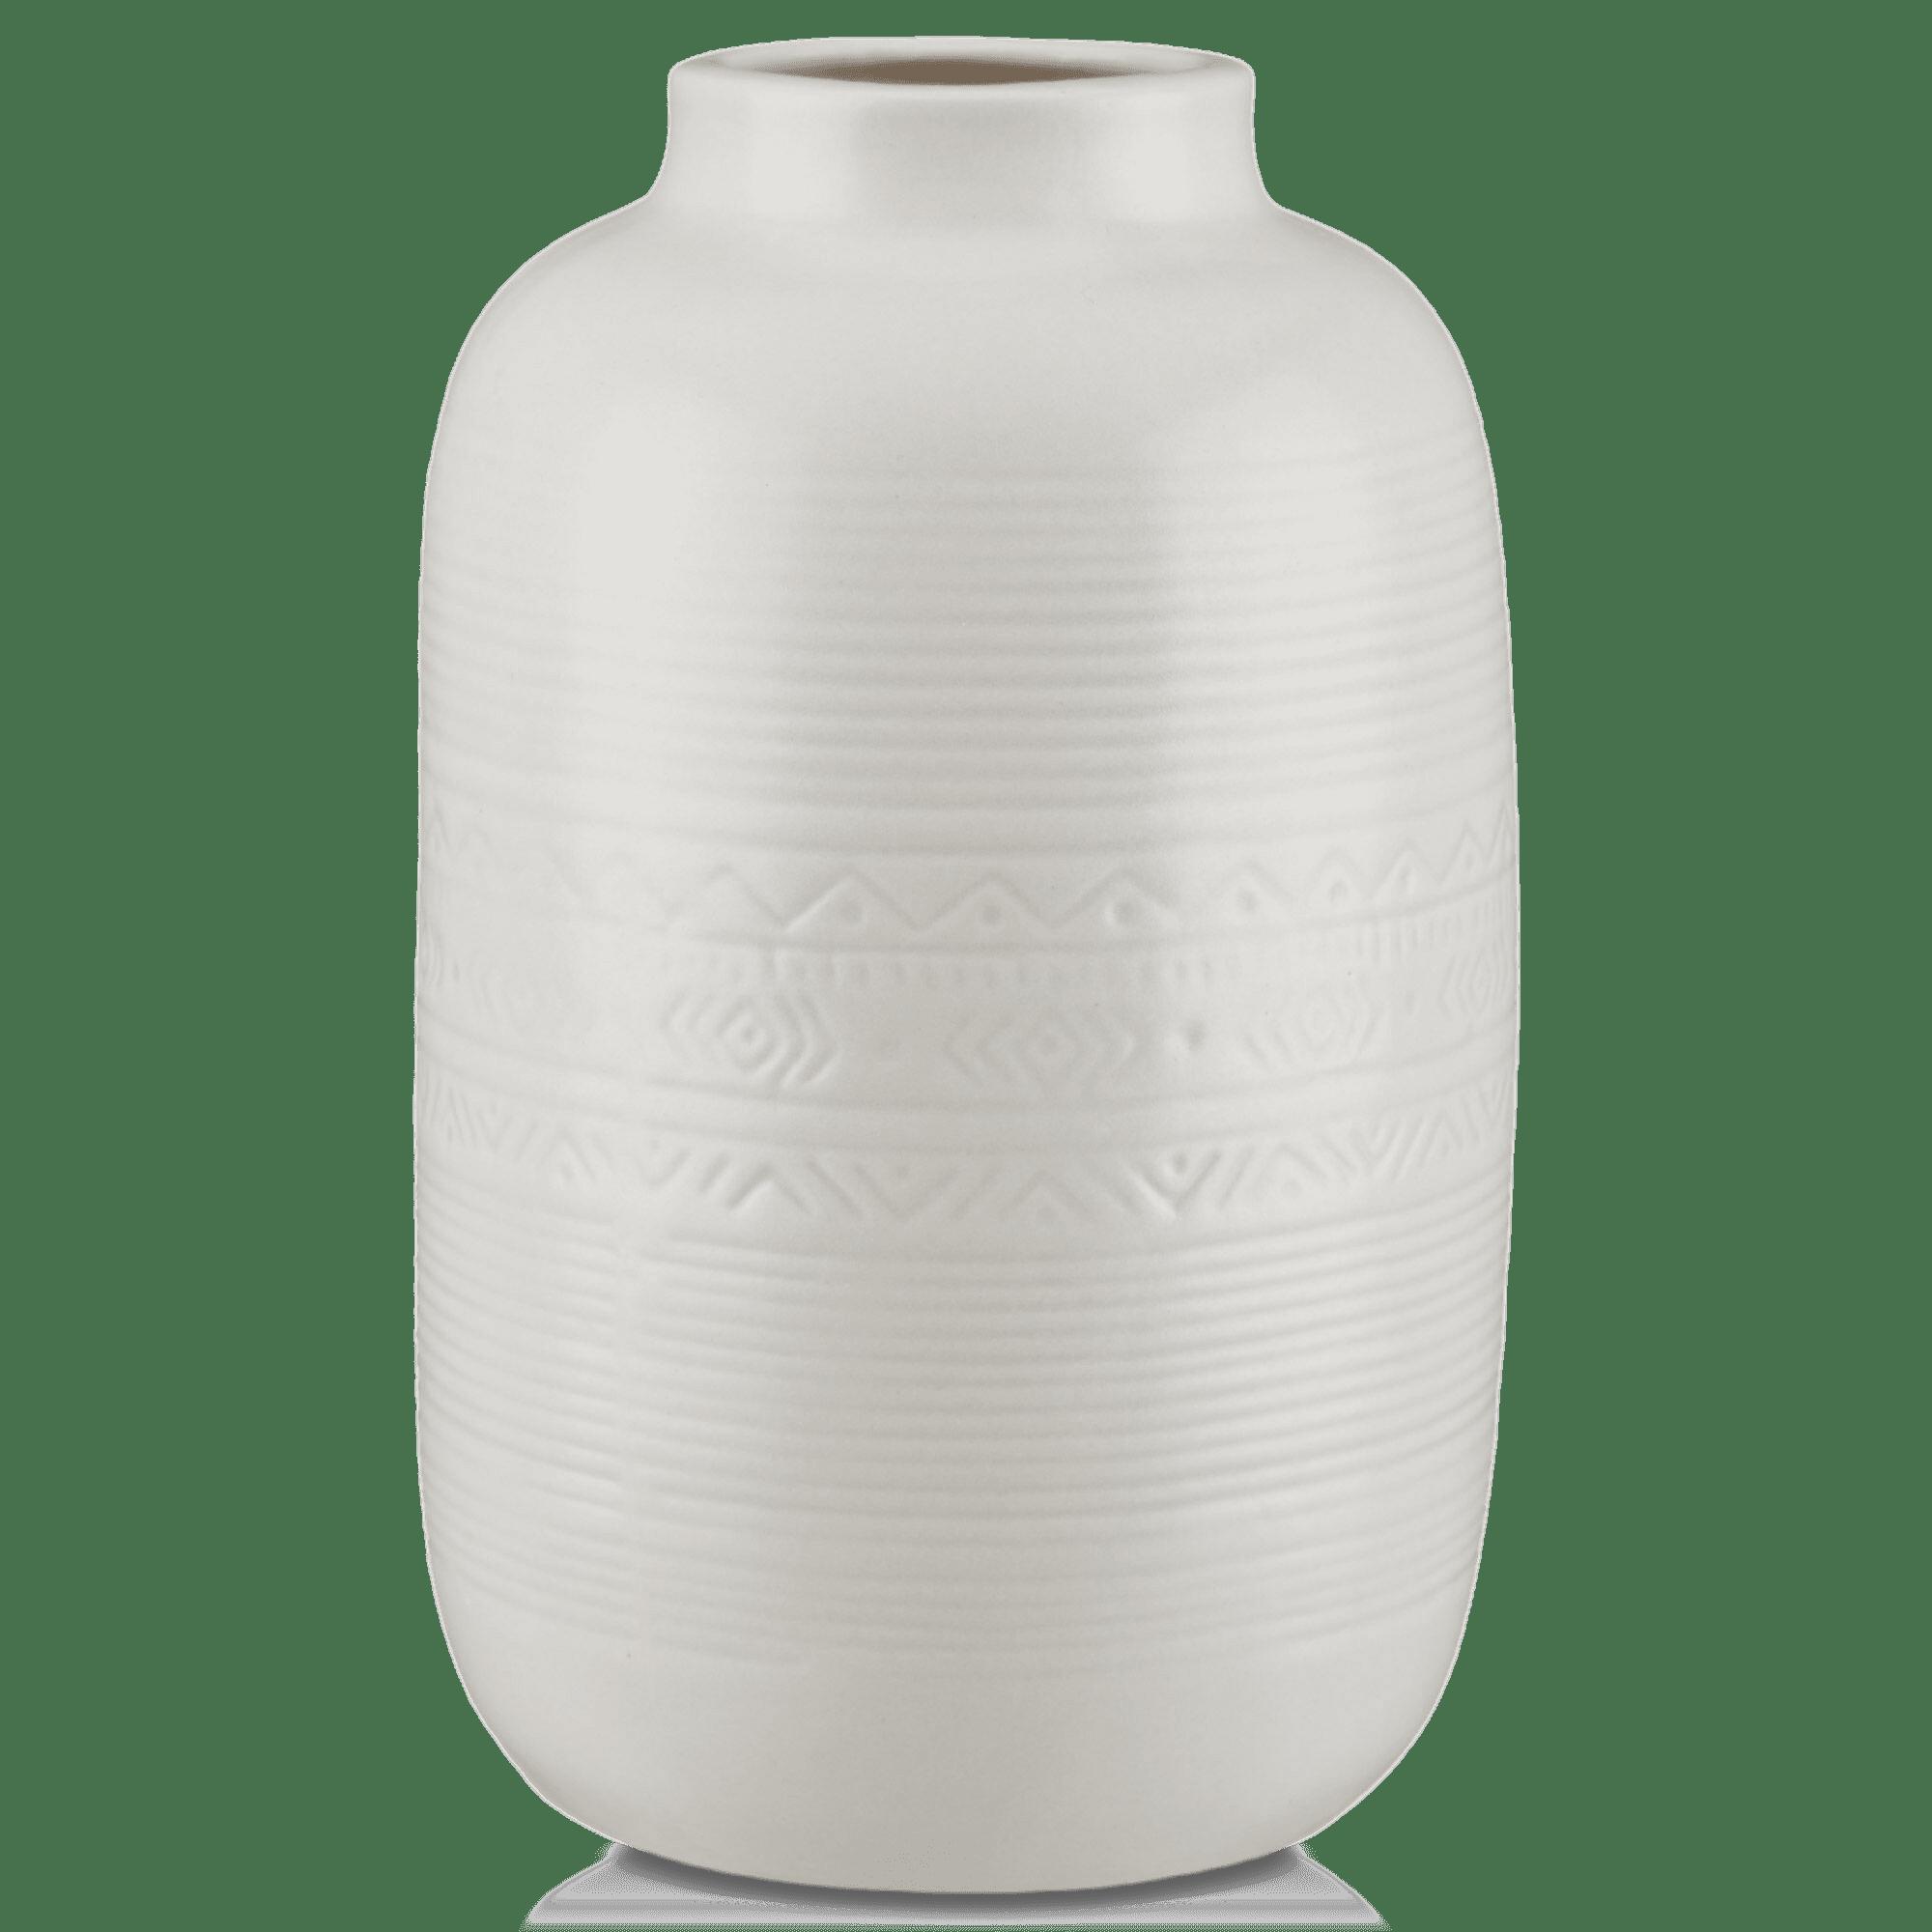 Aztec Patterned White Ceramic Vase